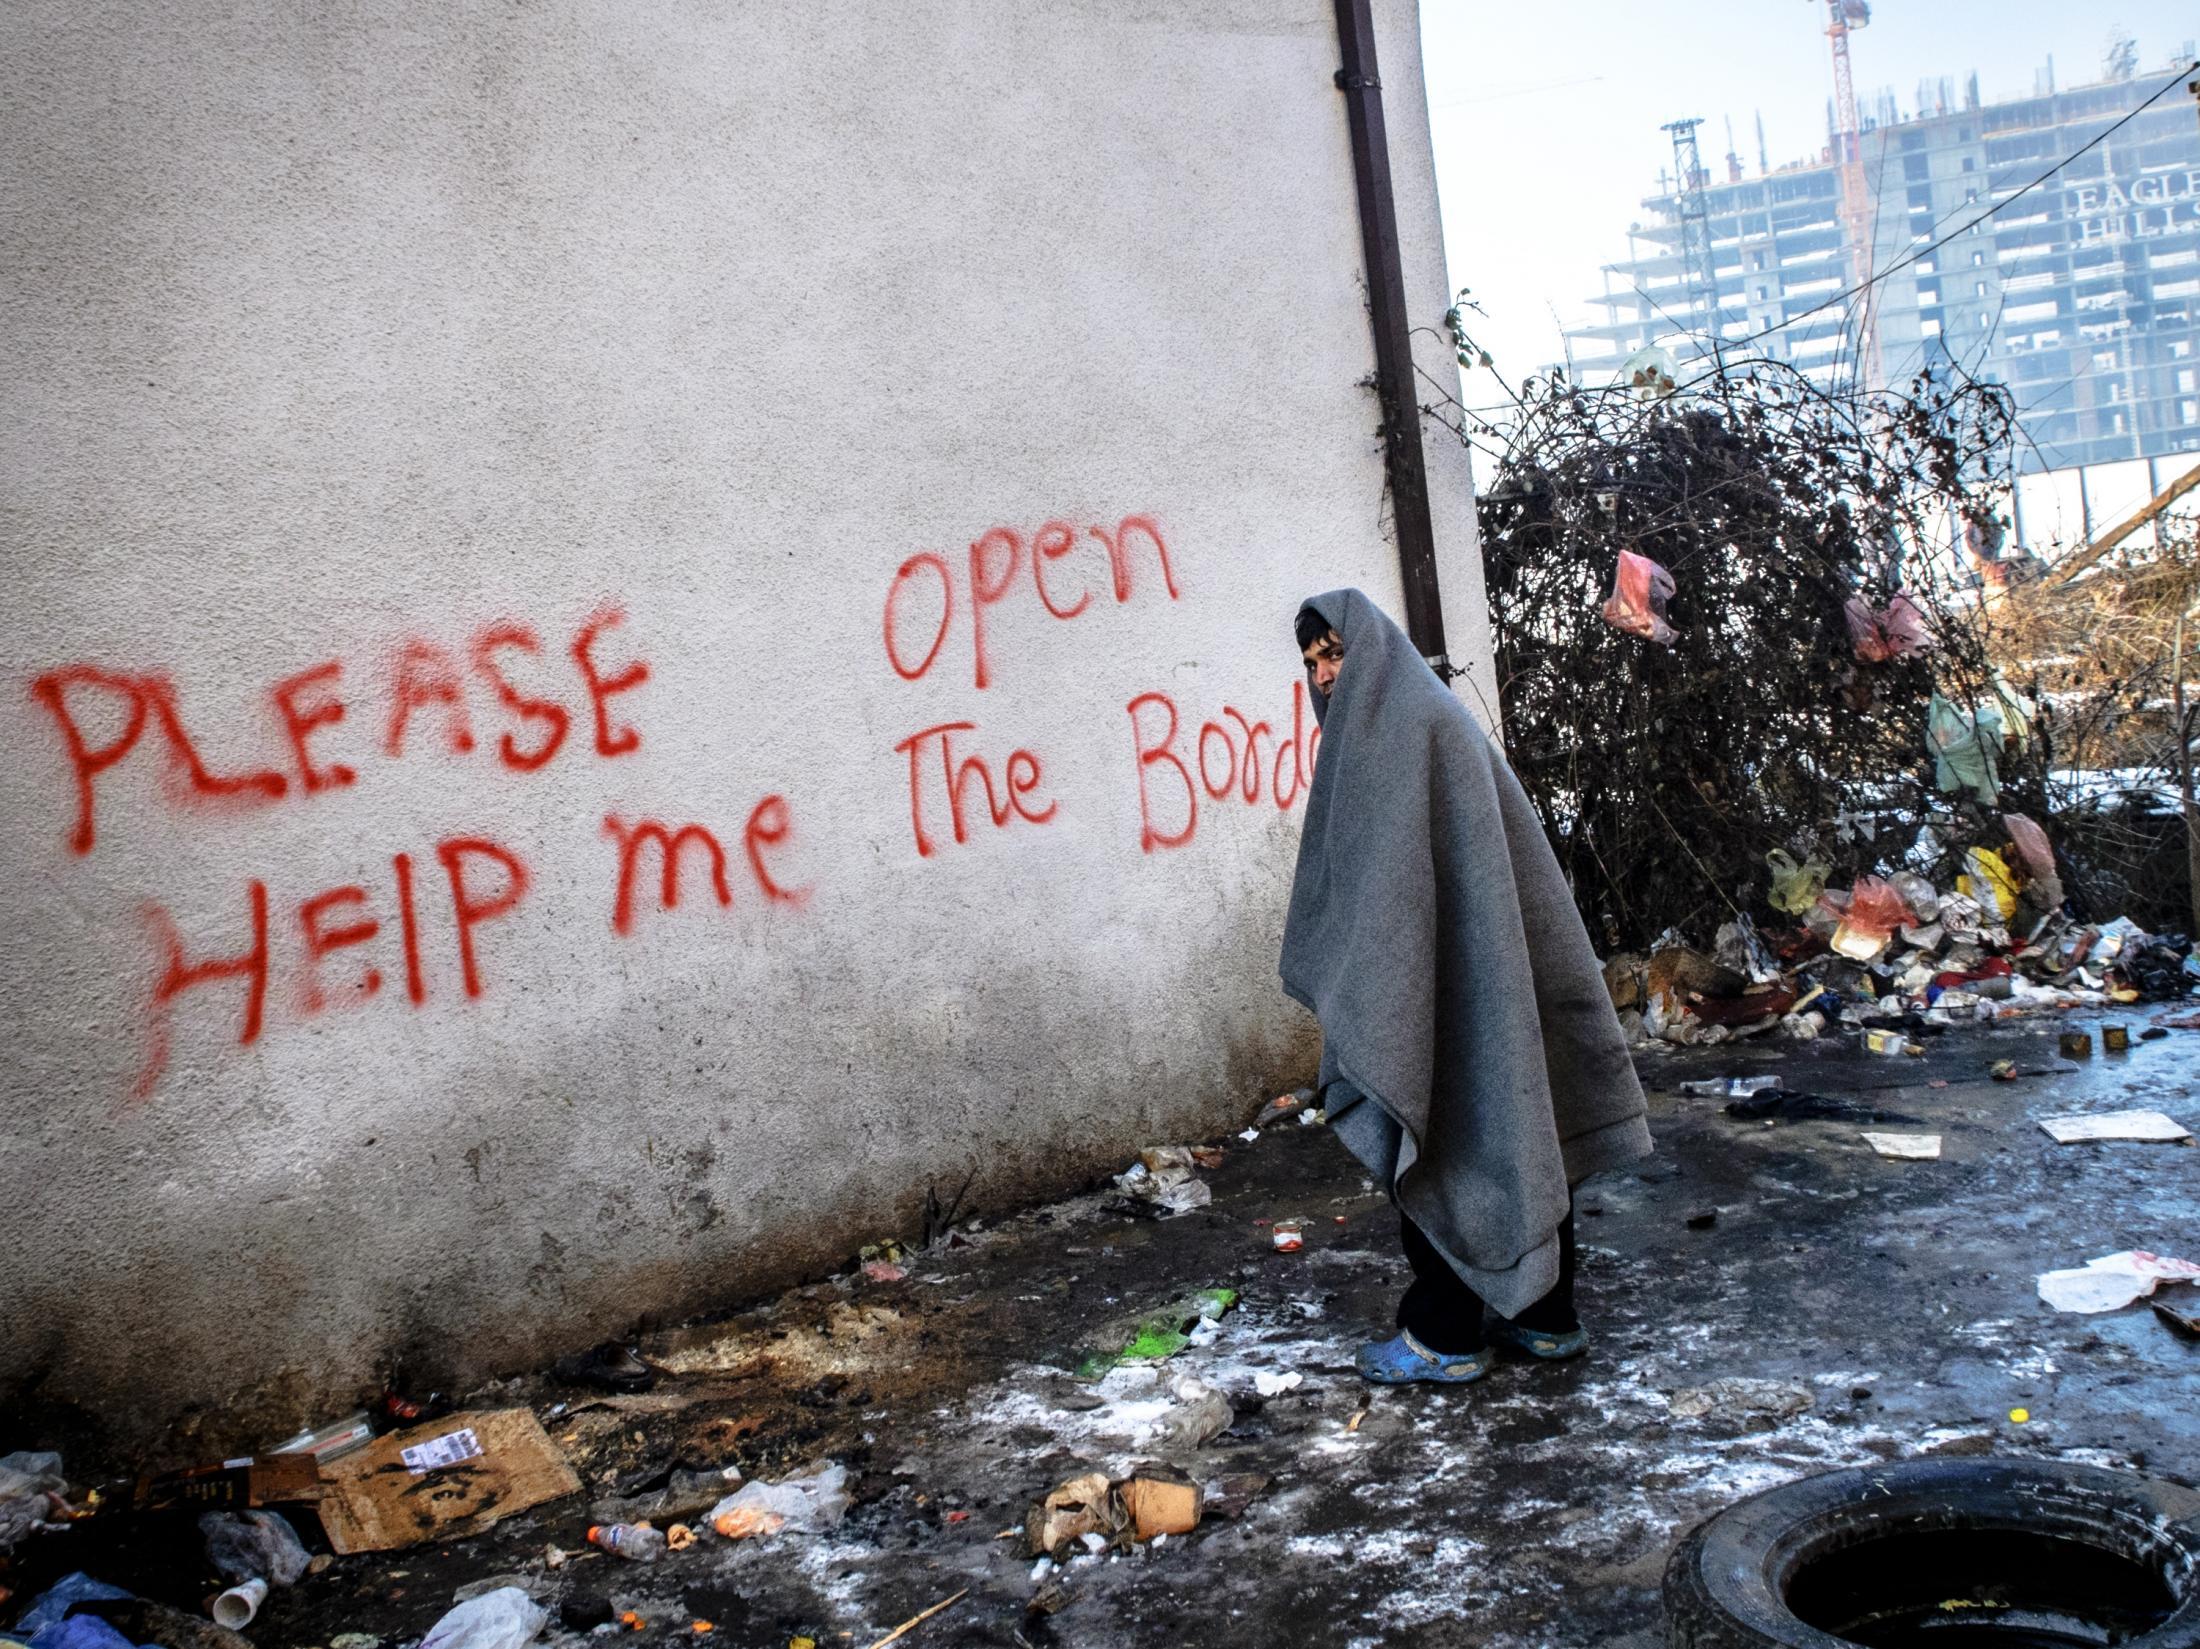 Belgrade, Serbia 2017